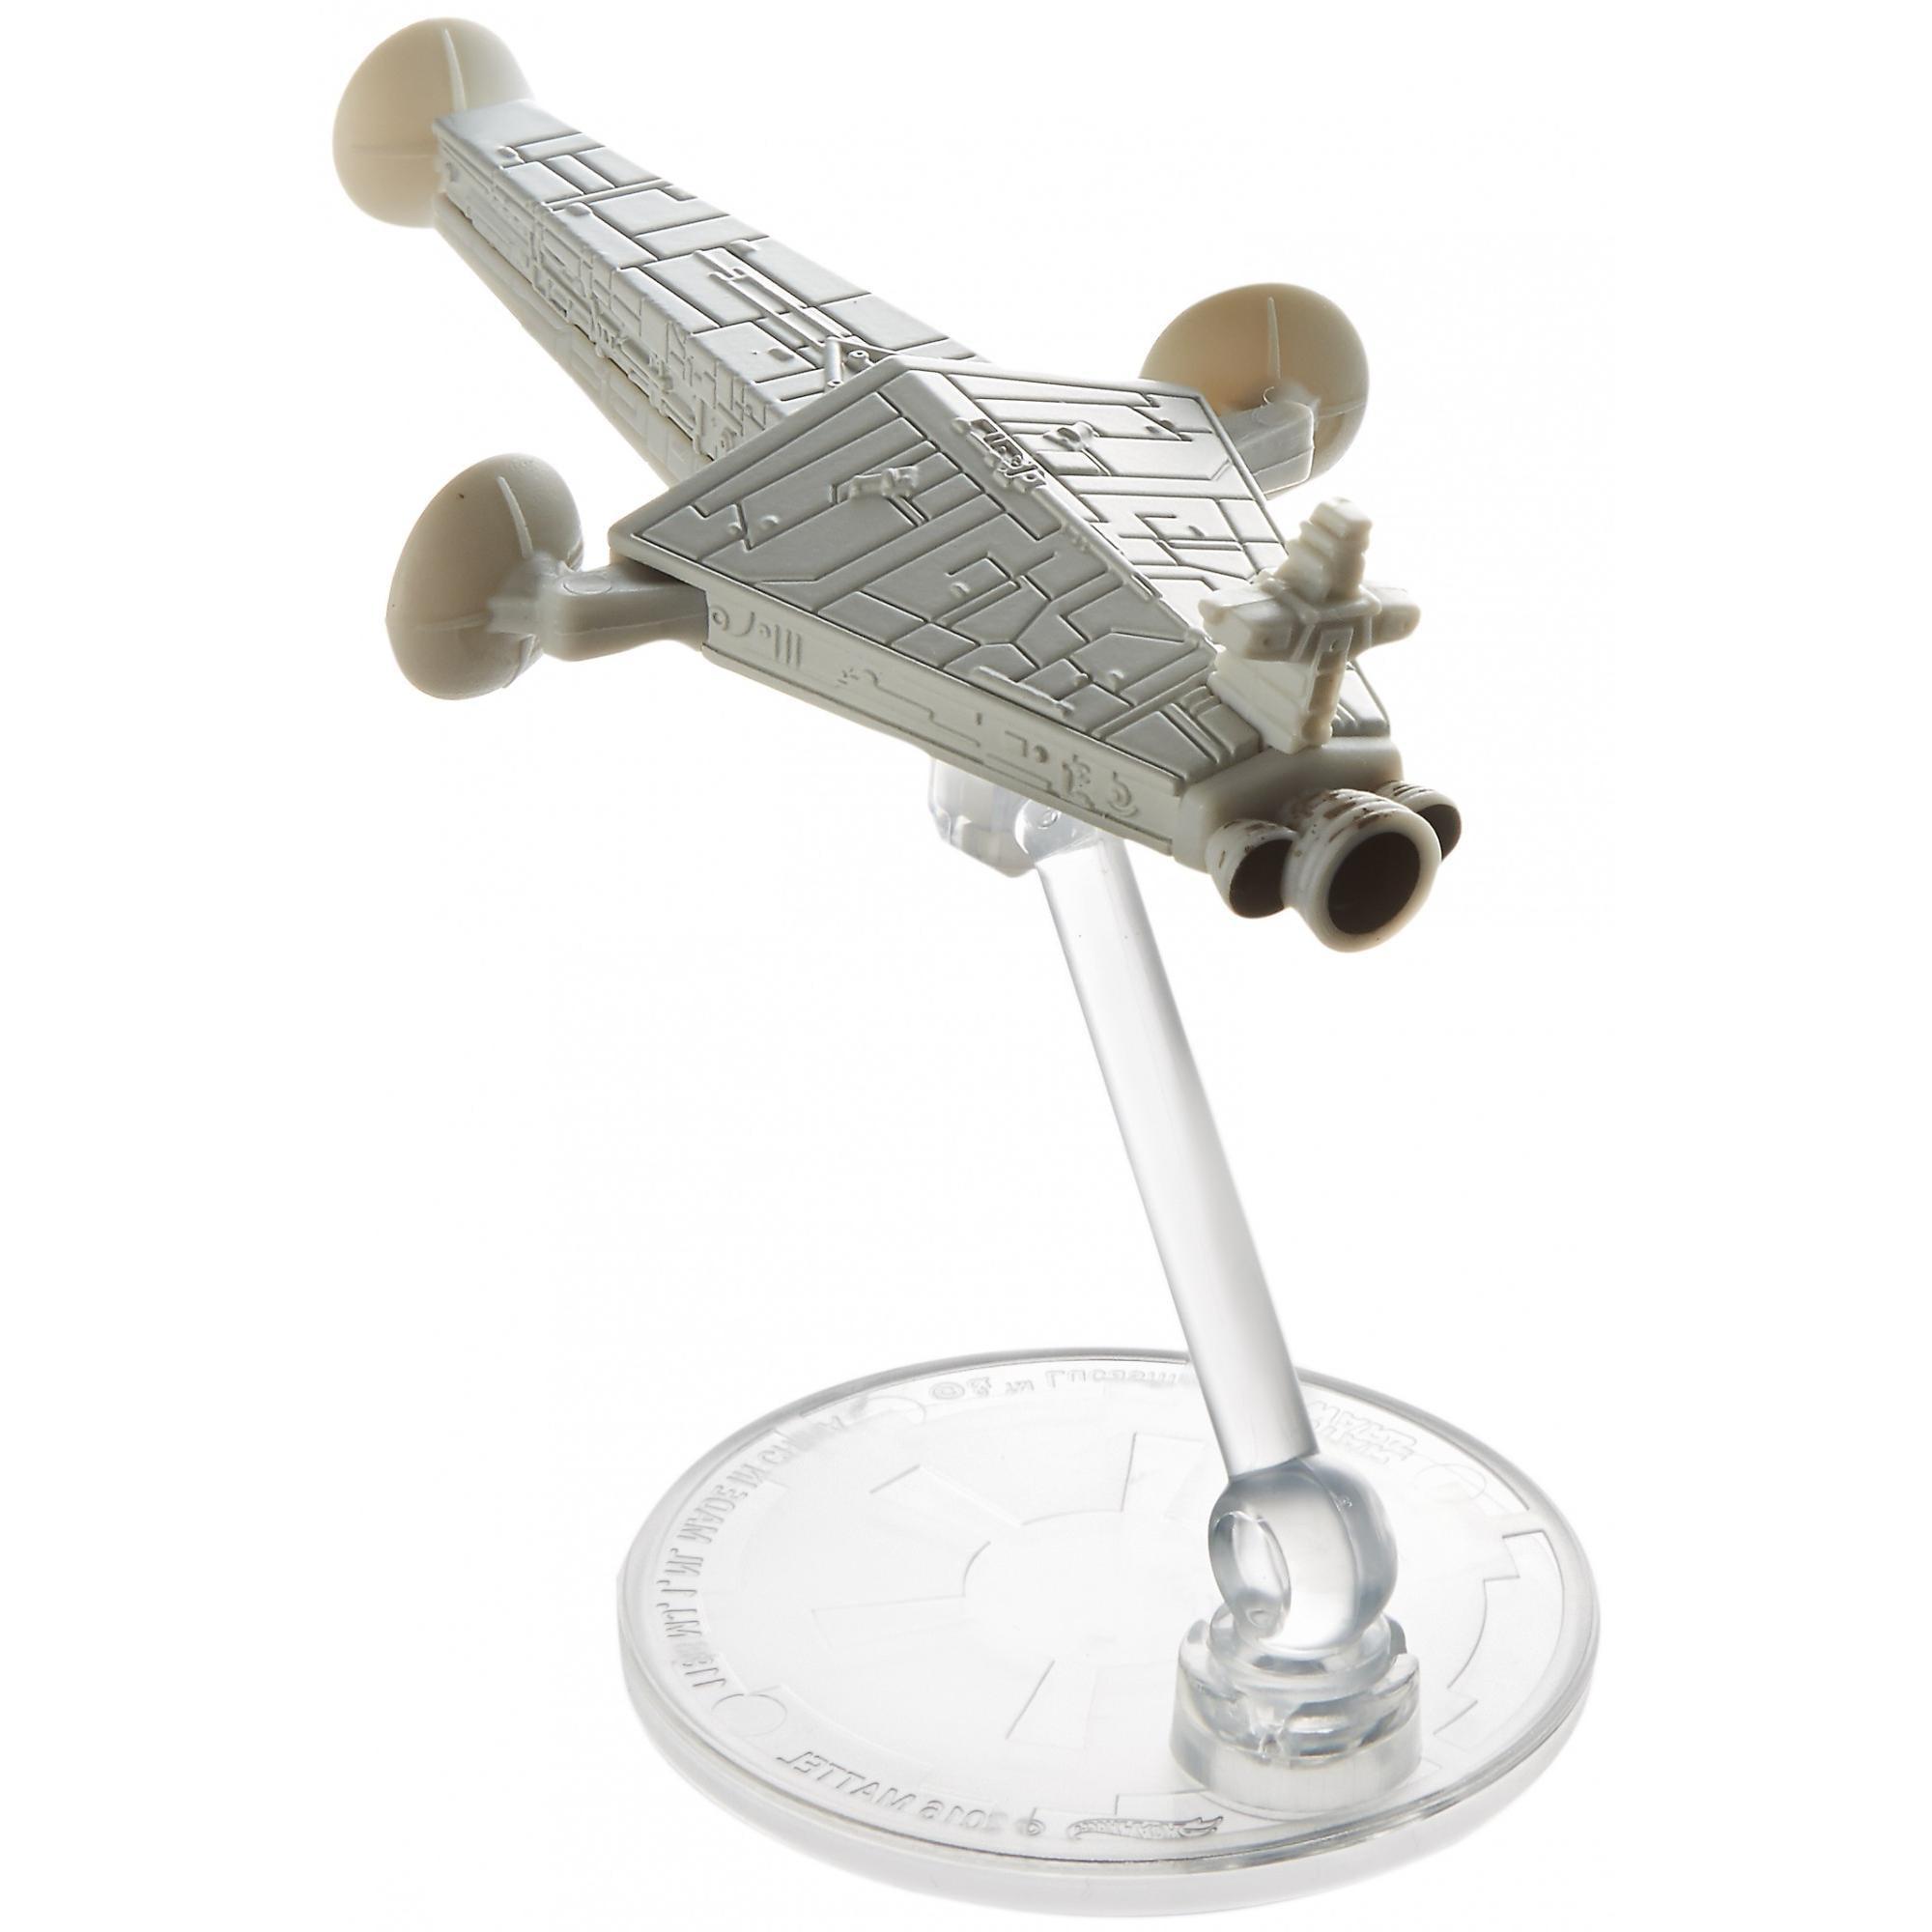 Hot Wheels Star Wars Starships Imperial Arrestor Cruiser